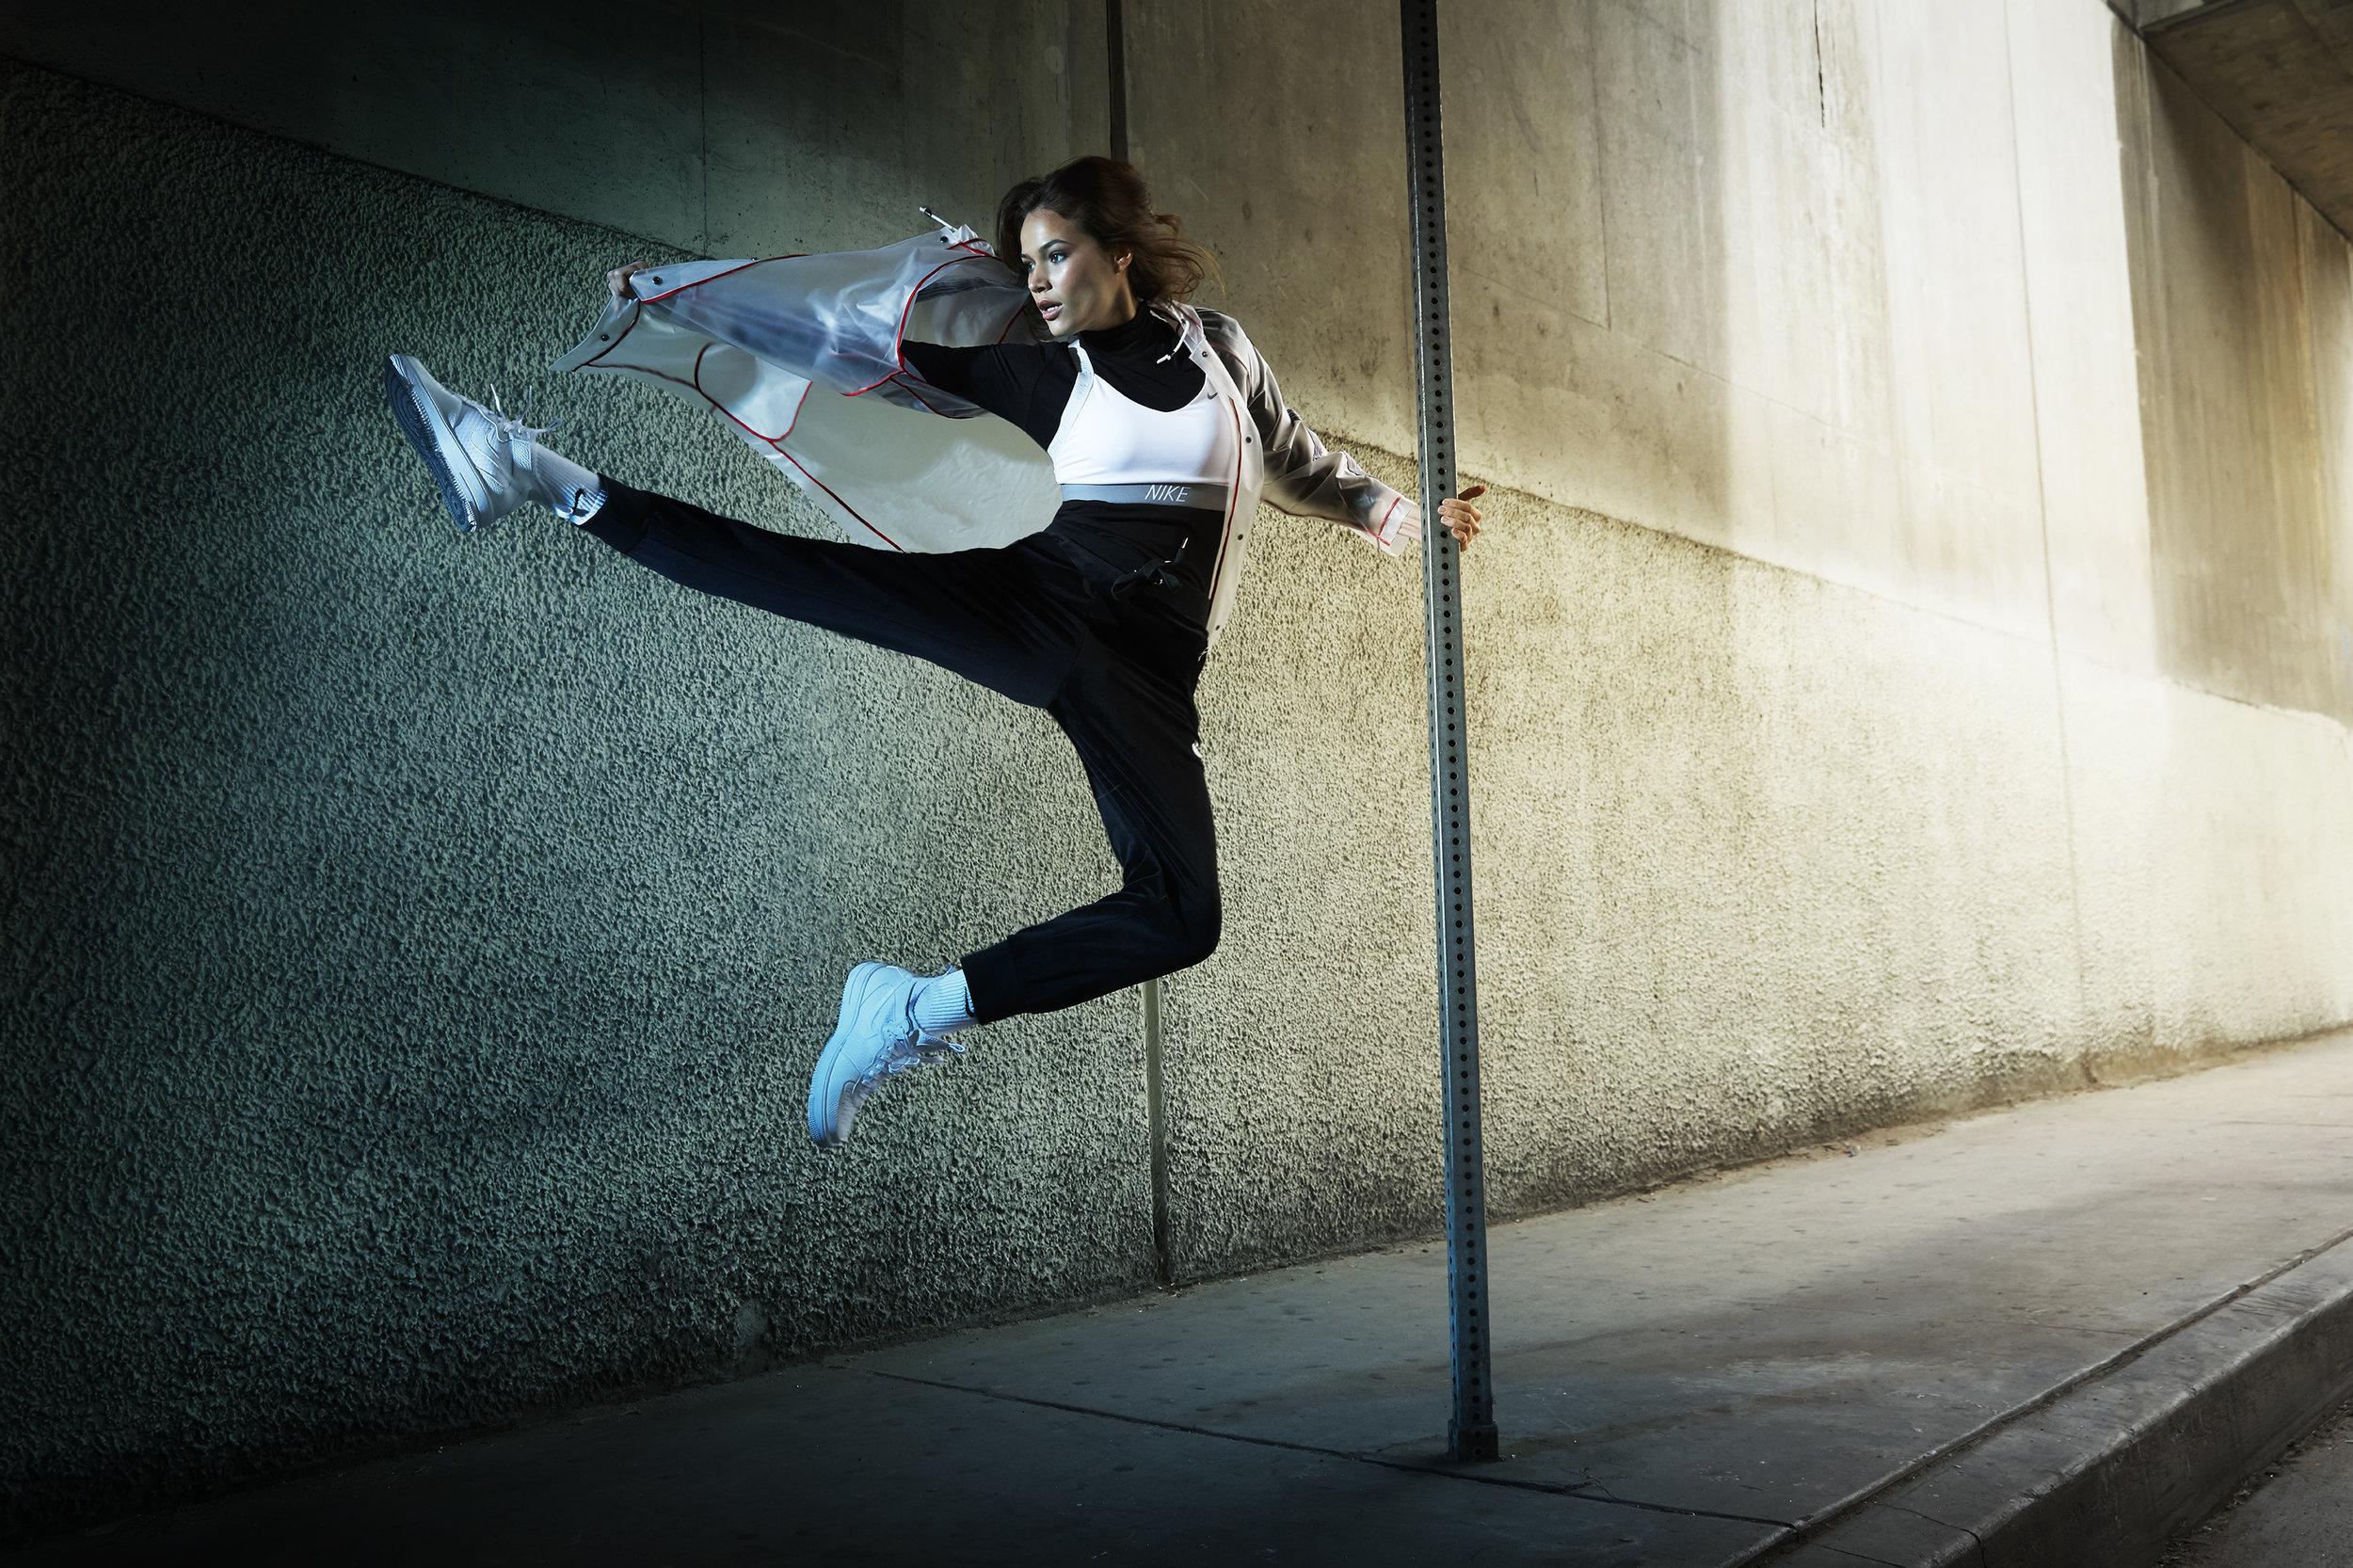 Nike-Location_0405.jpg